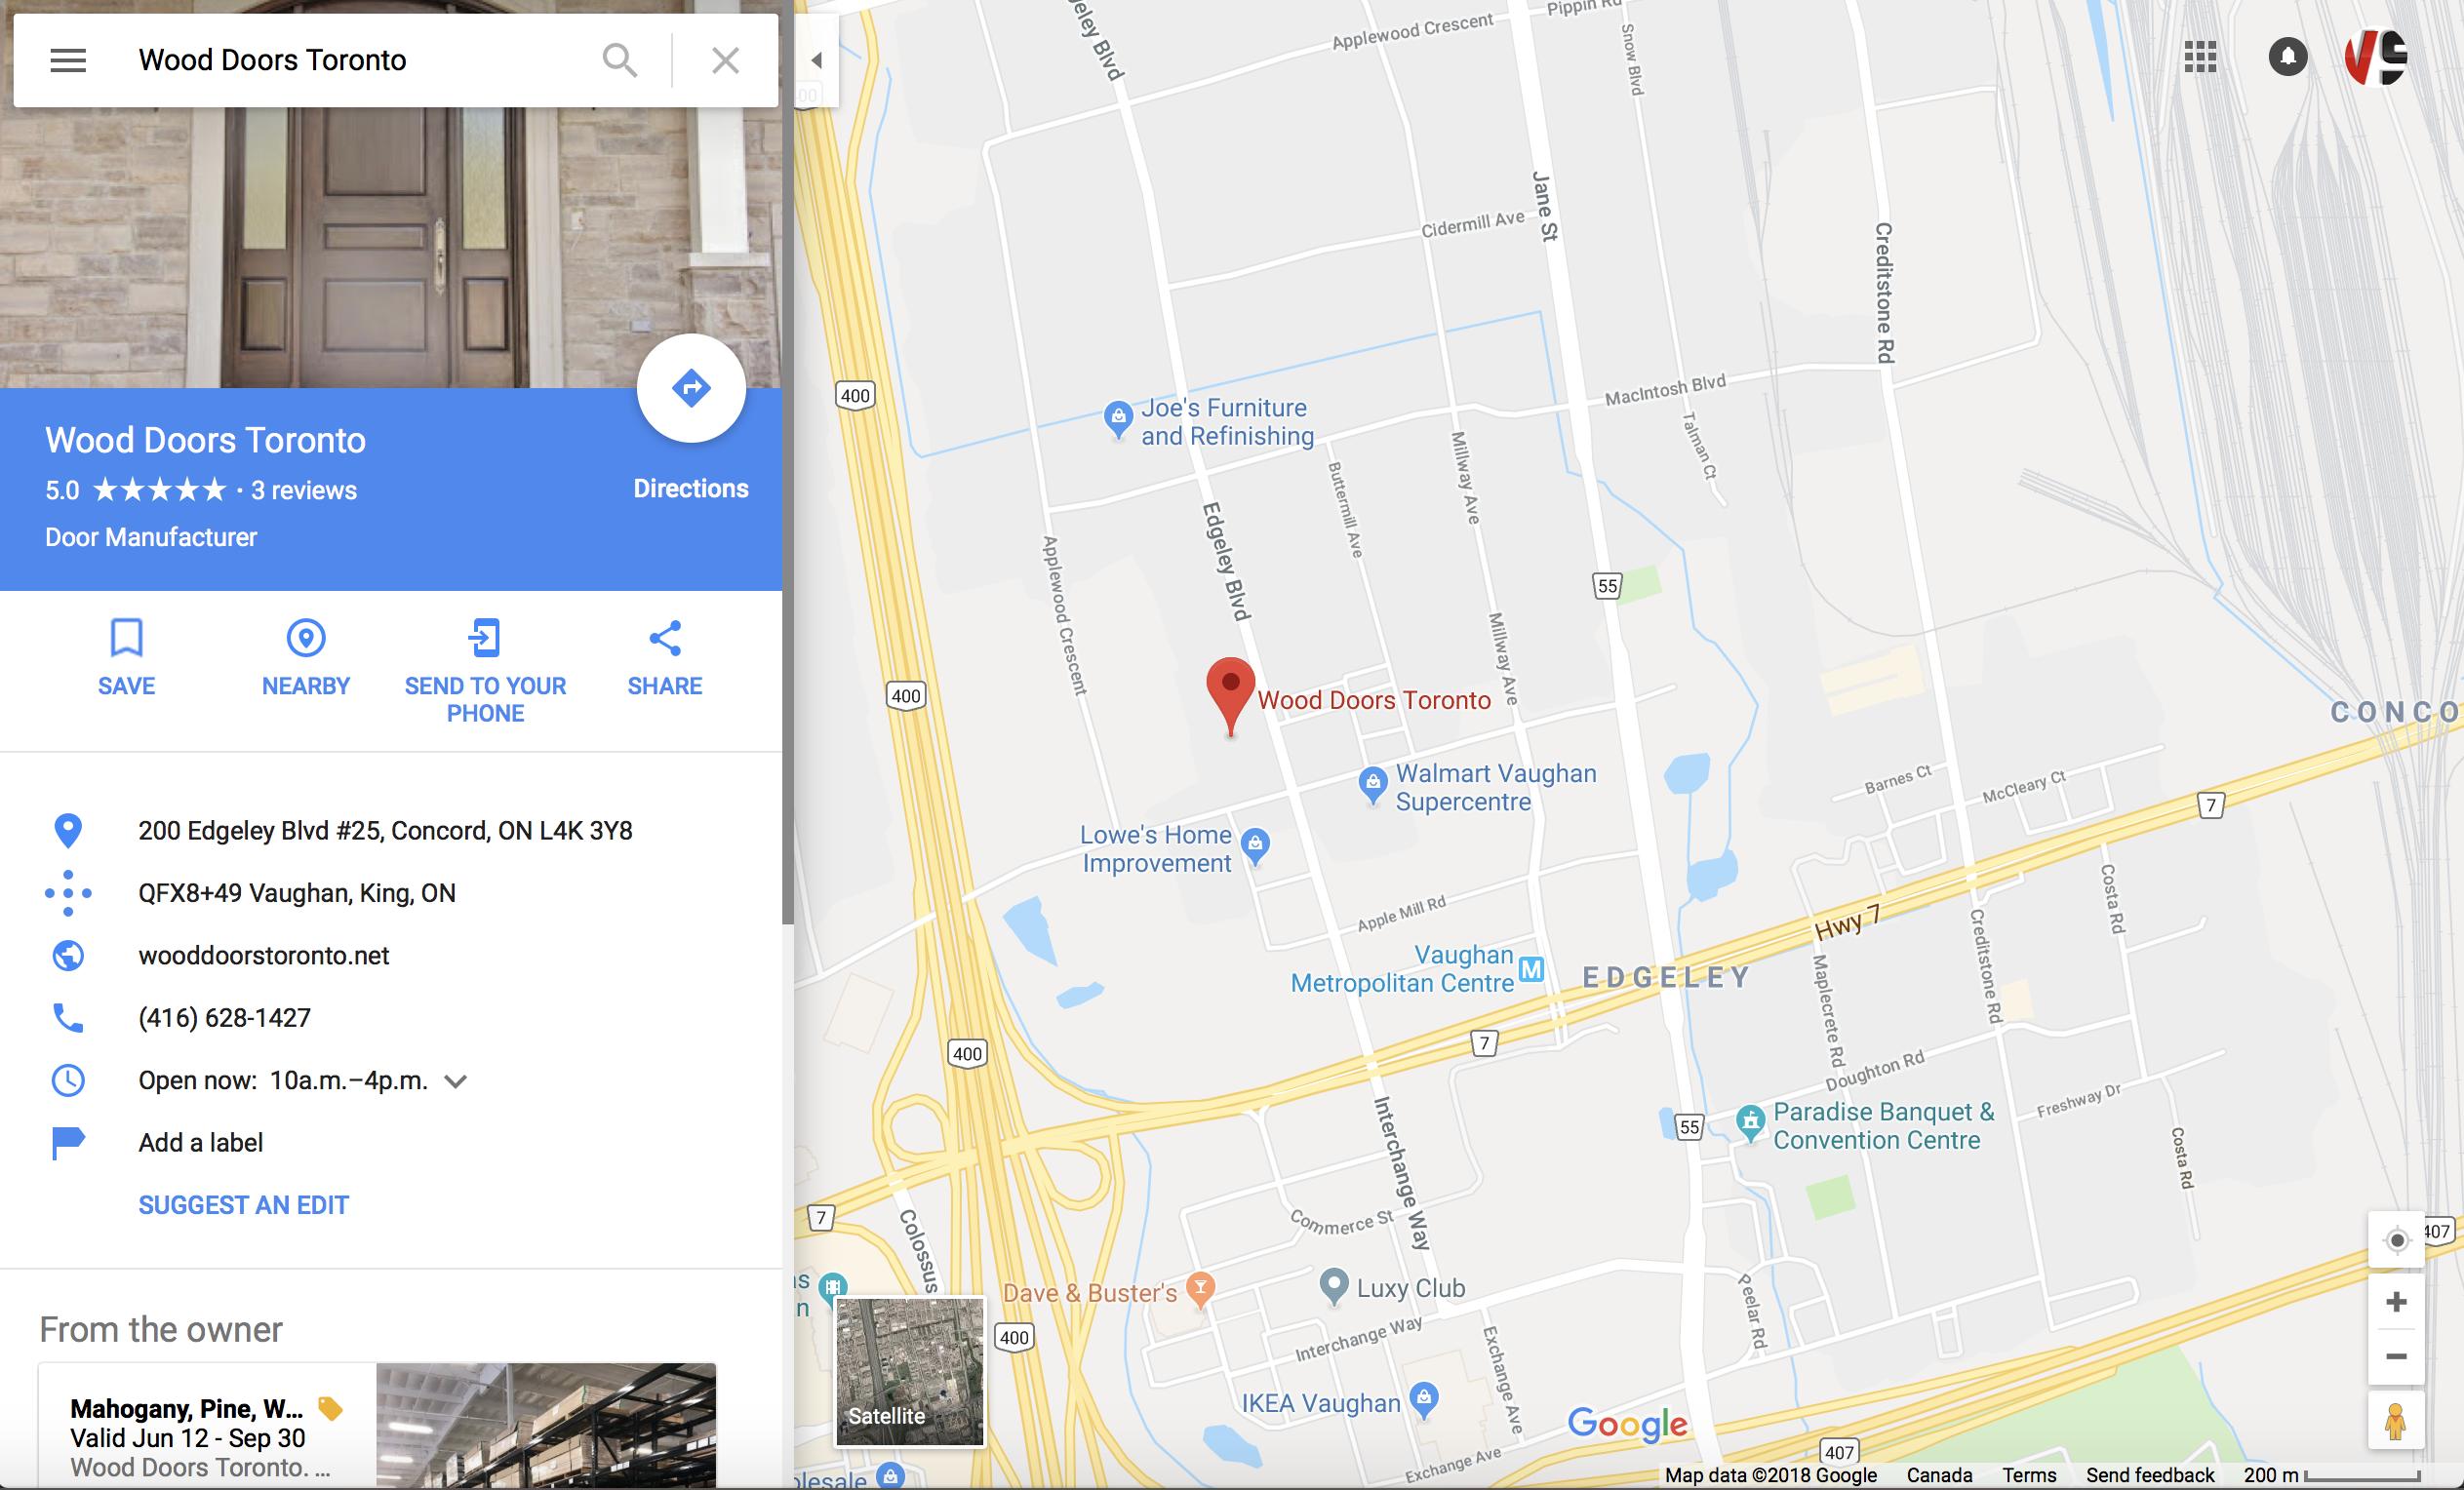 https://goo.gl/maps/HBvNtpS4box